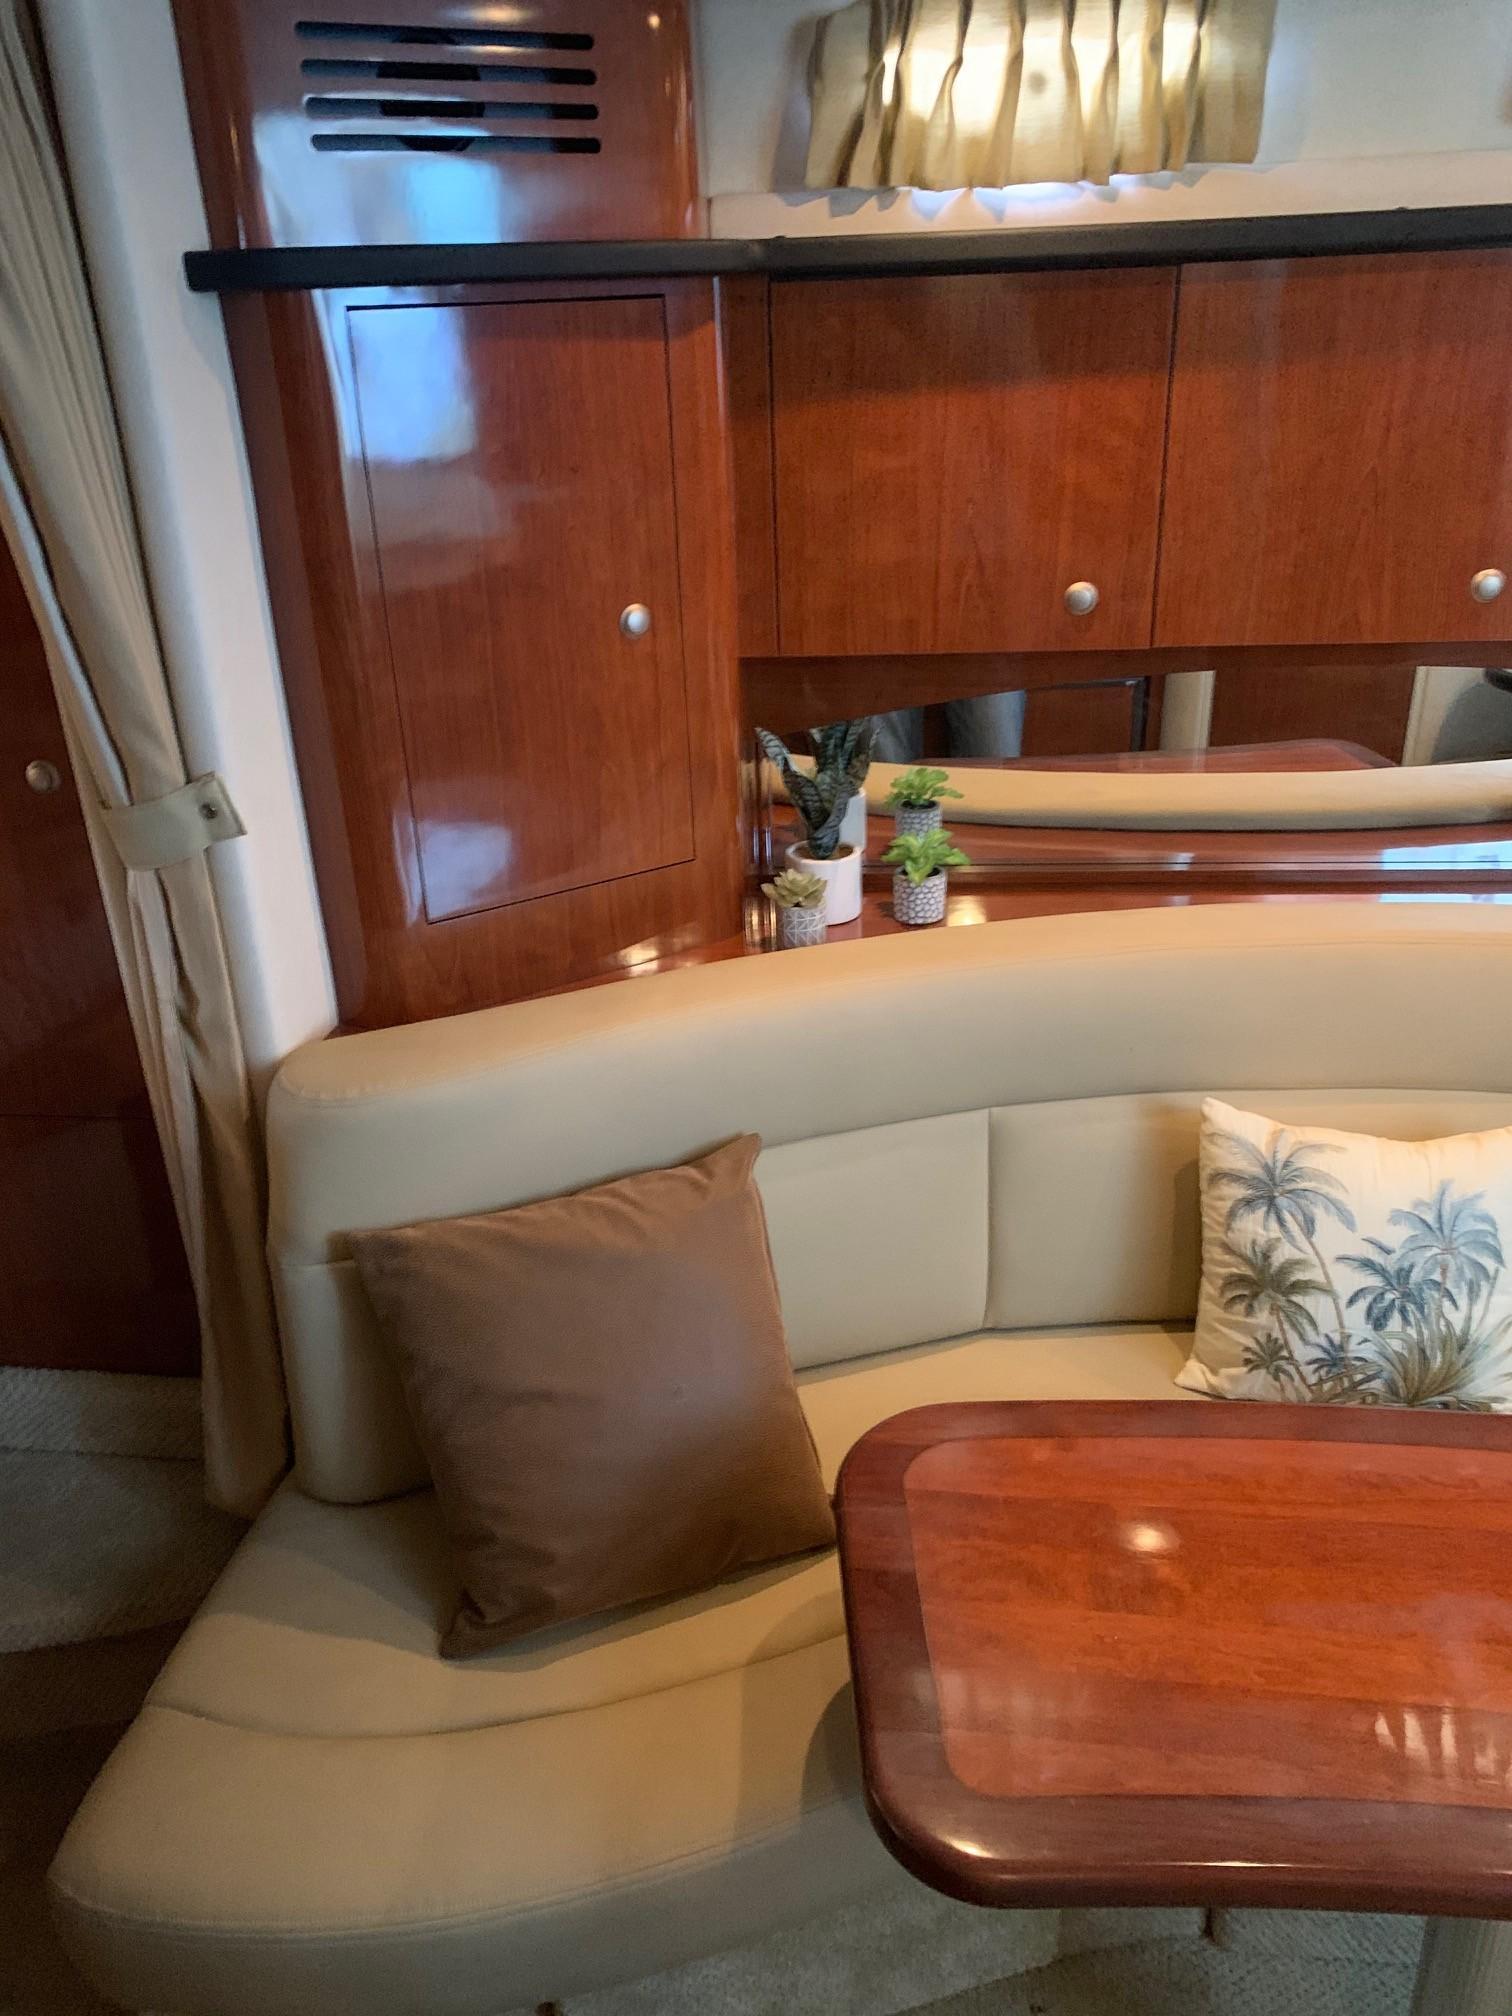 Sea Ray 320 Sundancer - Salon Cabinetry